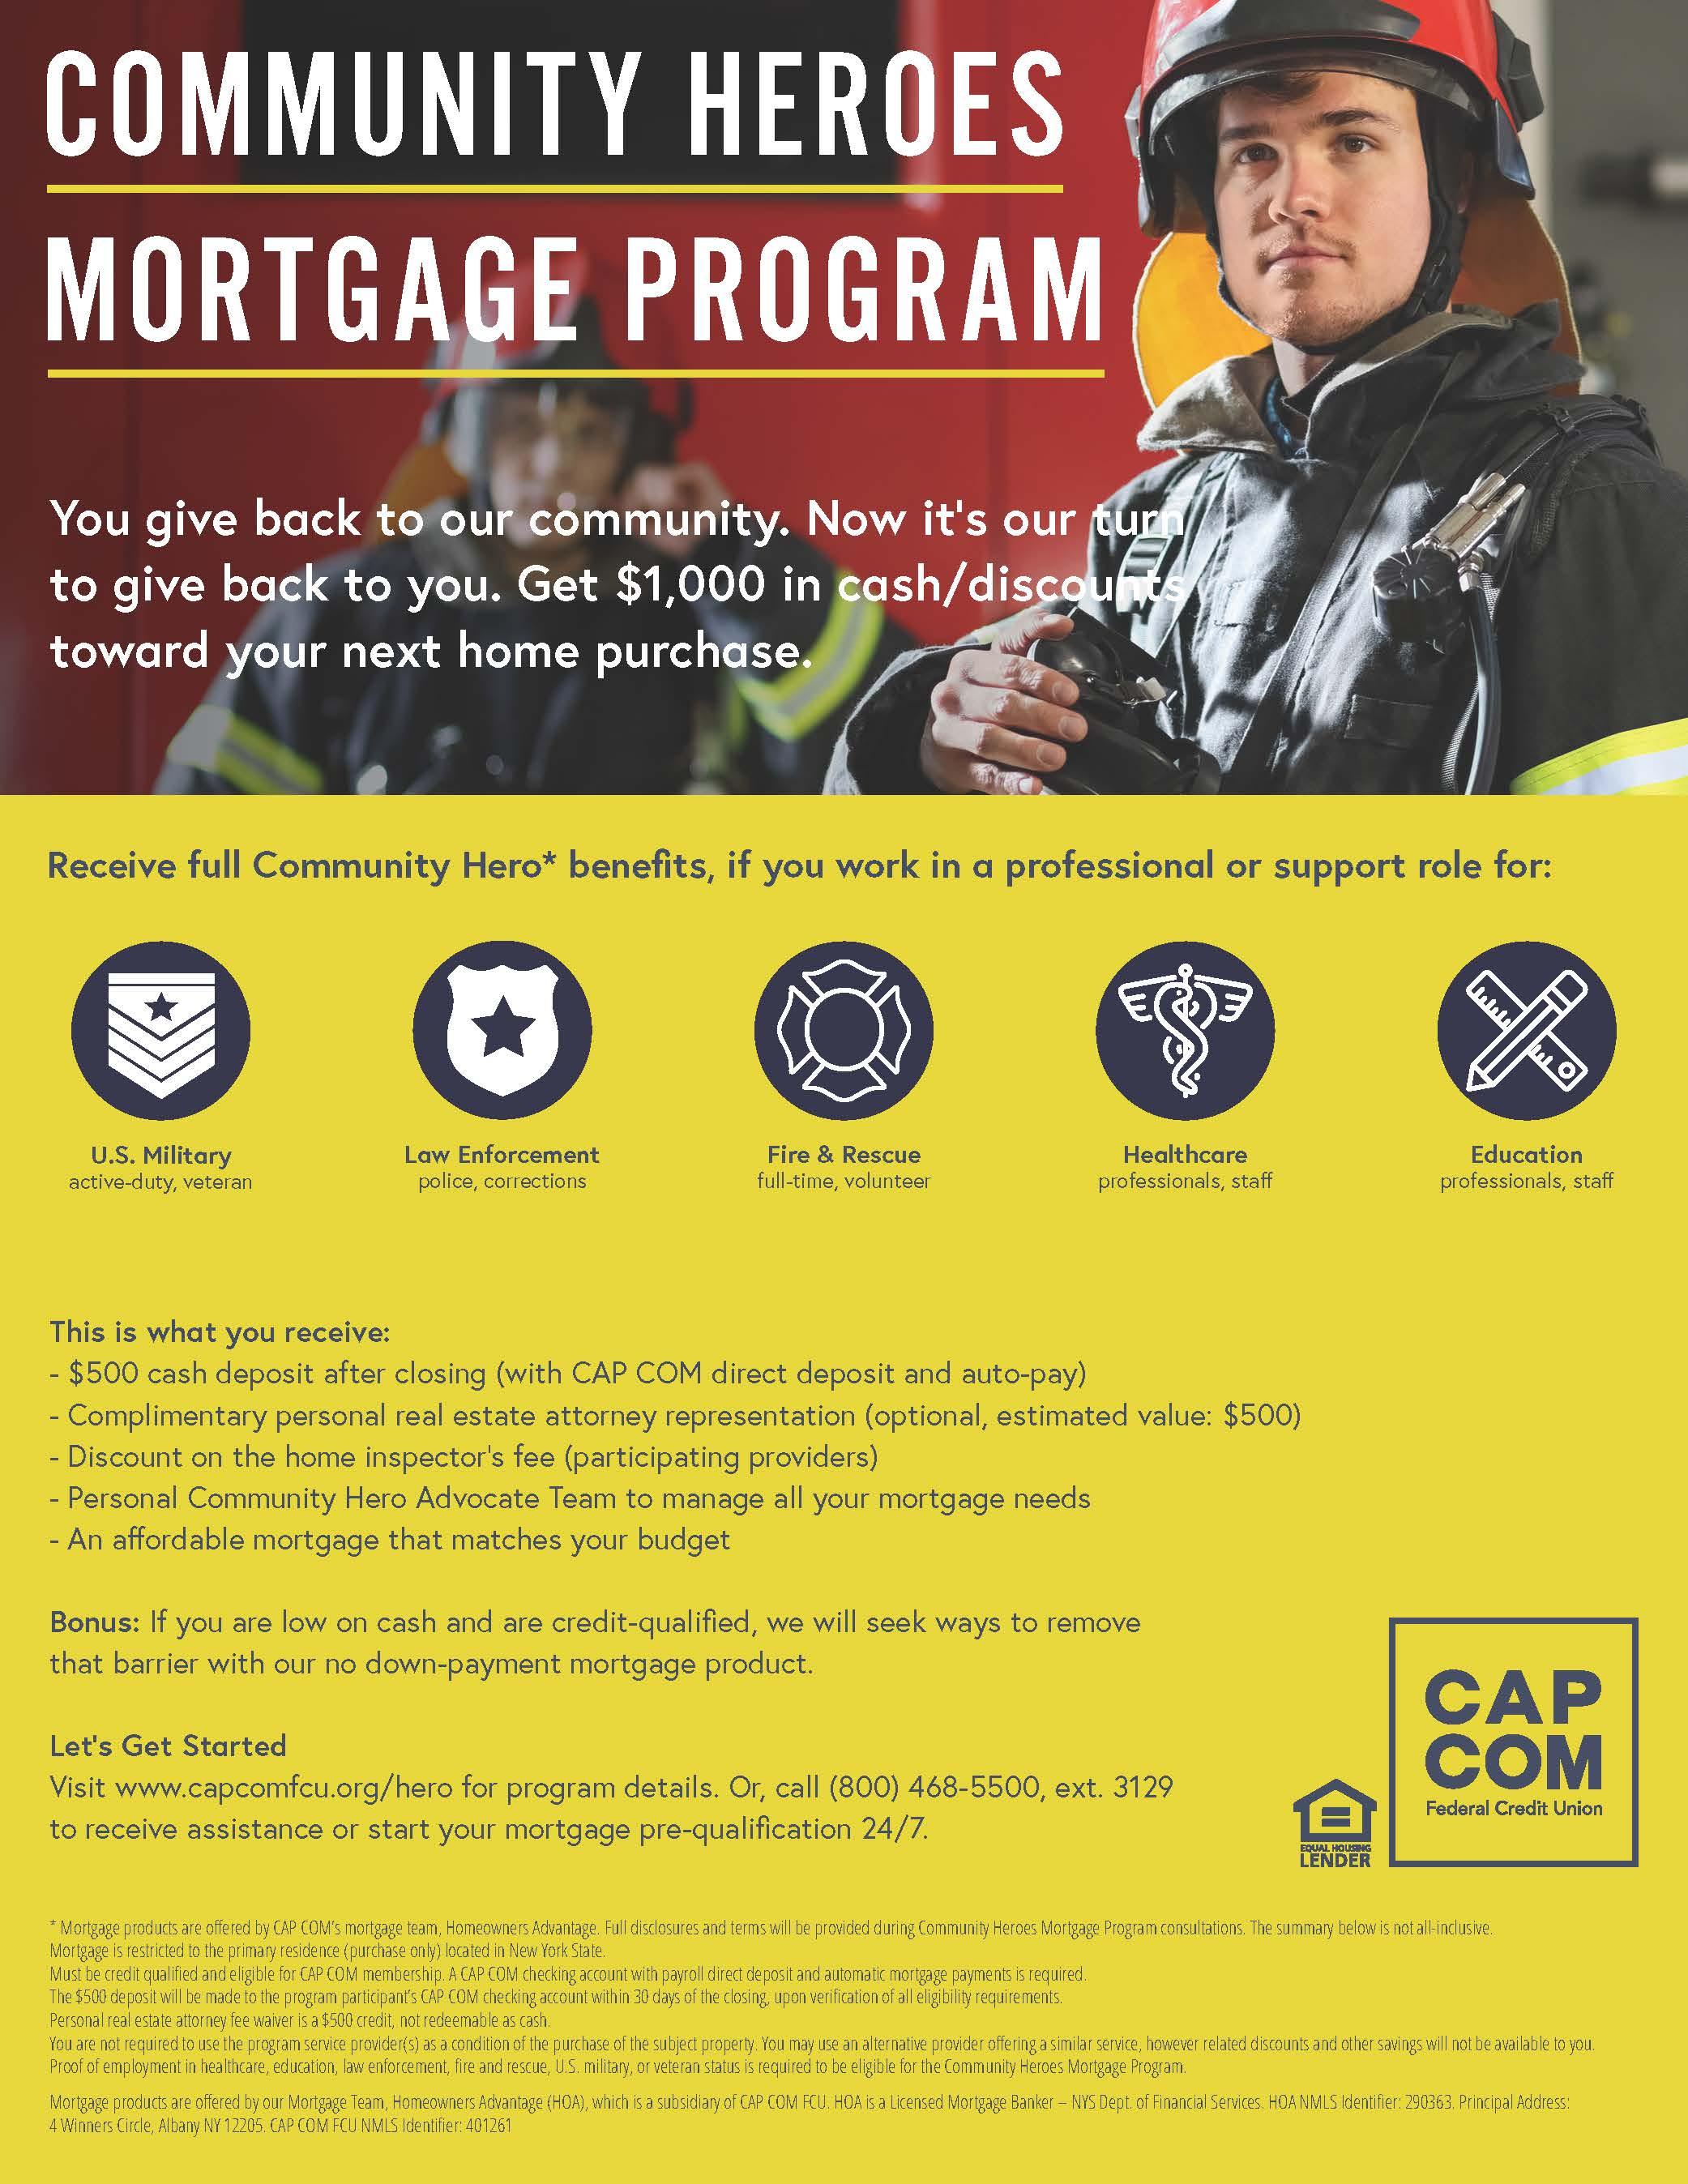 CAP COM Launches Community Heroes Mortgage Program | WBC Voice